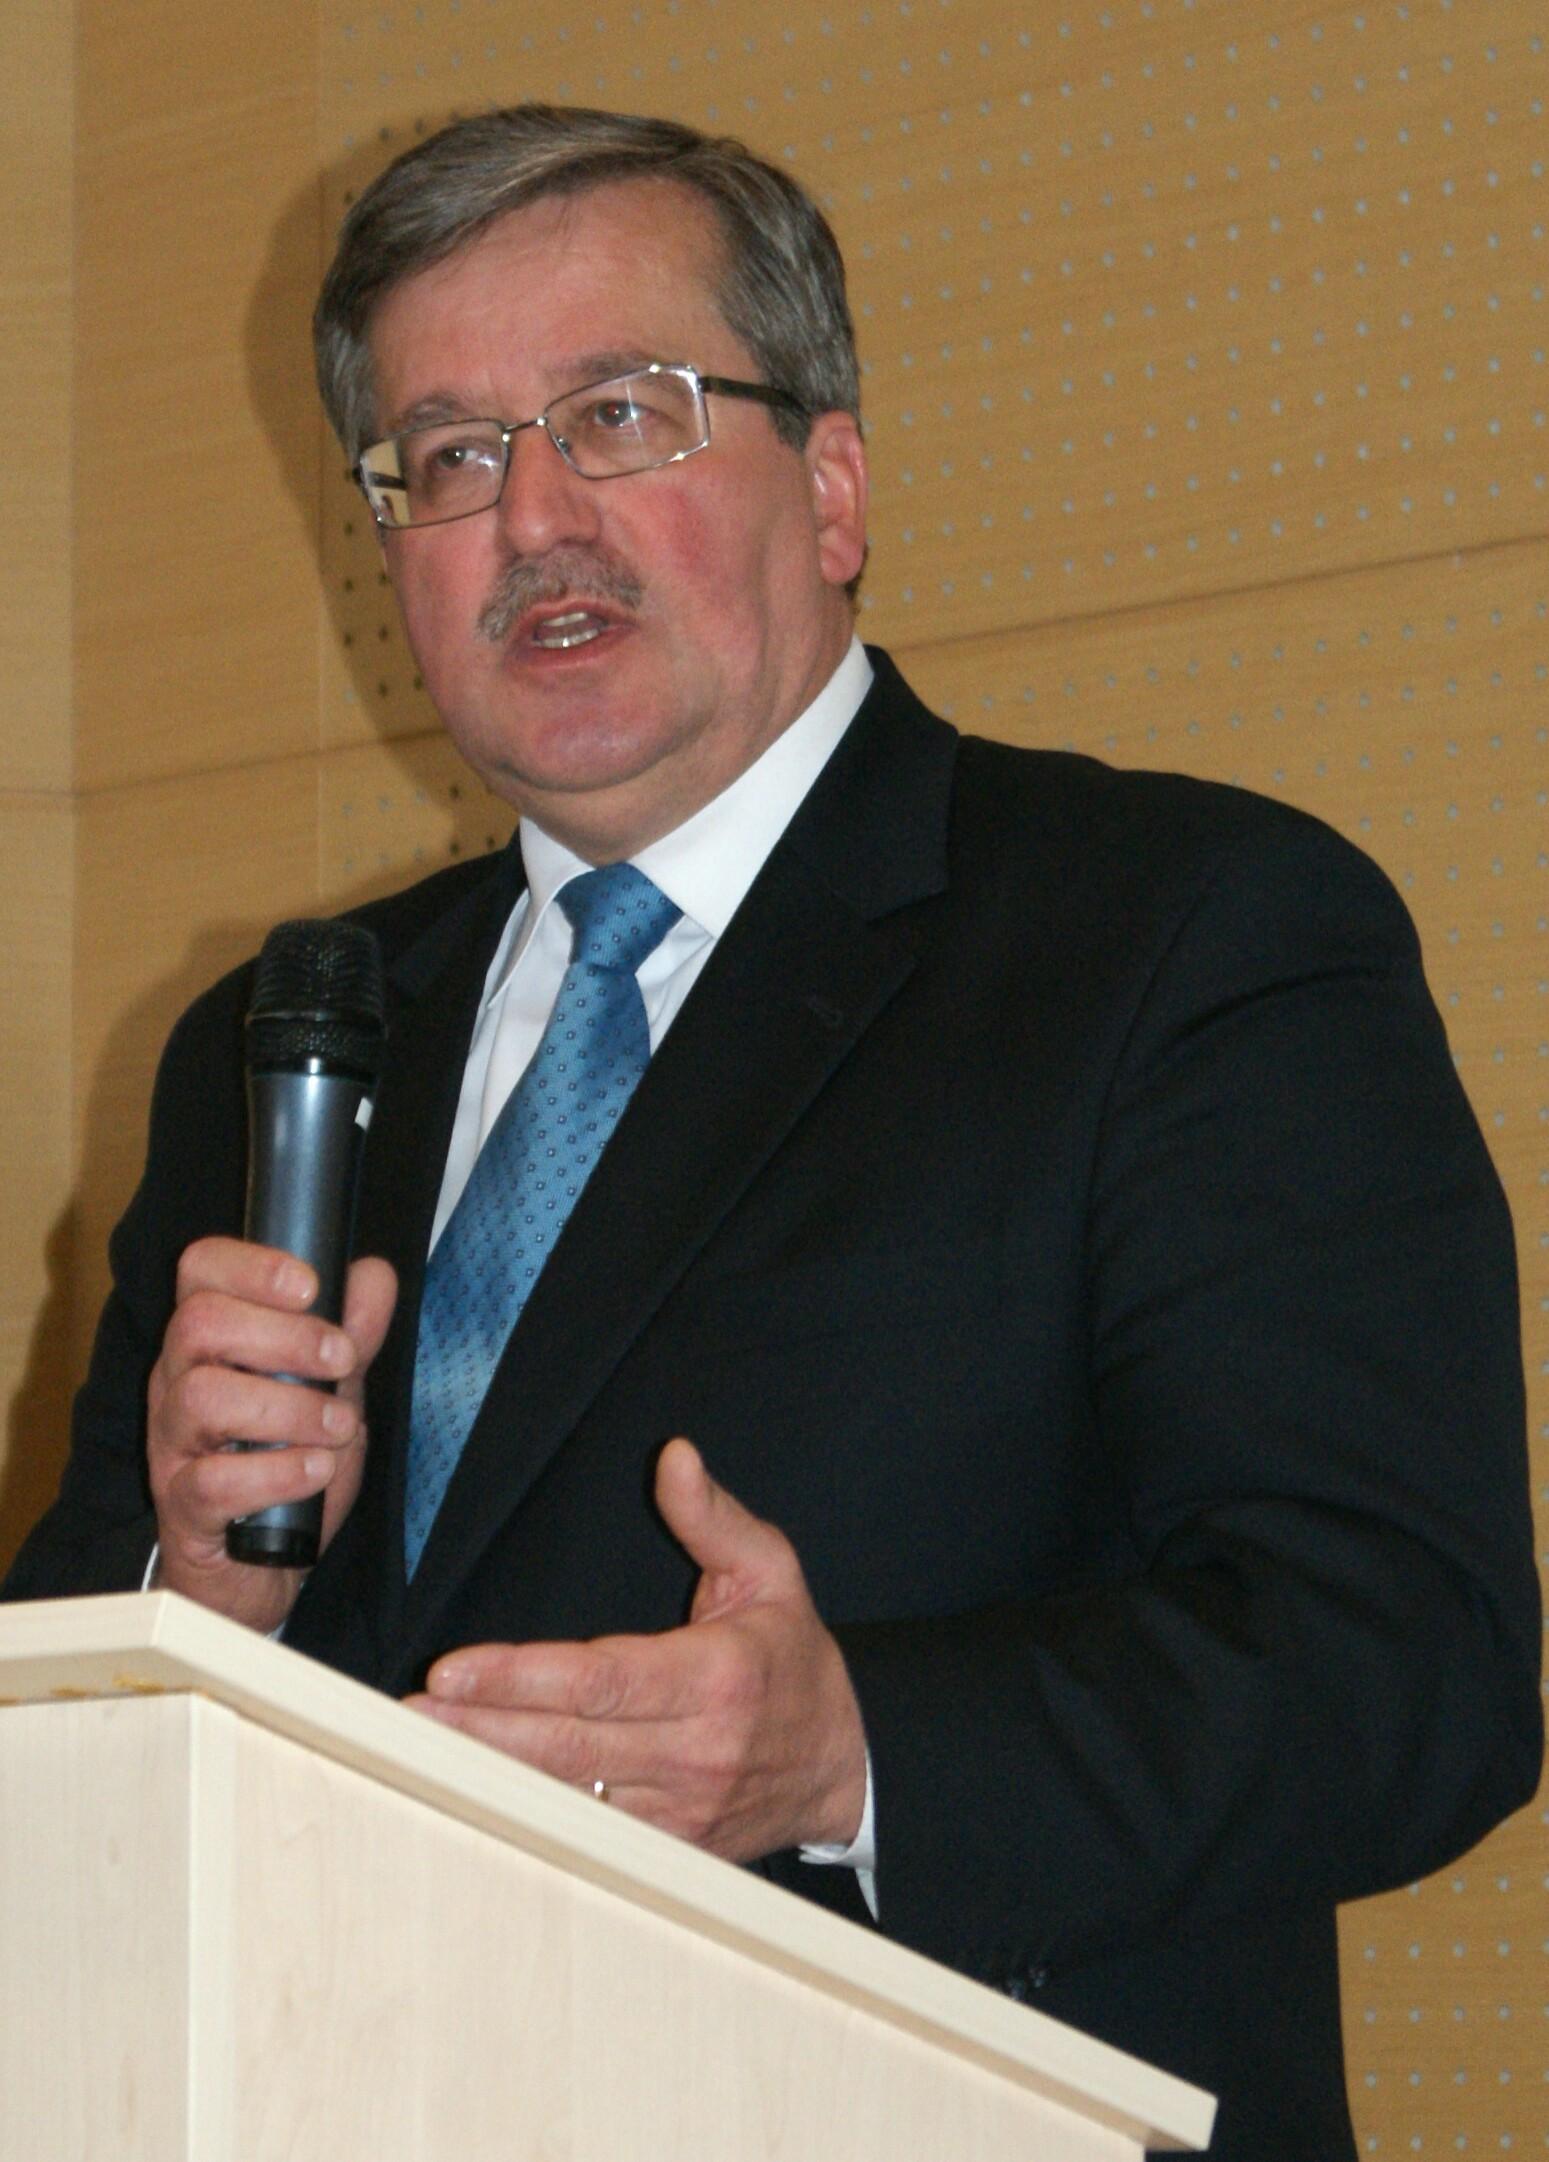 Präsidentschaftskandidat Bronislaw Komorowski